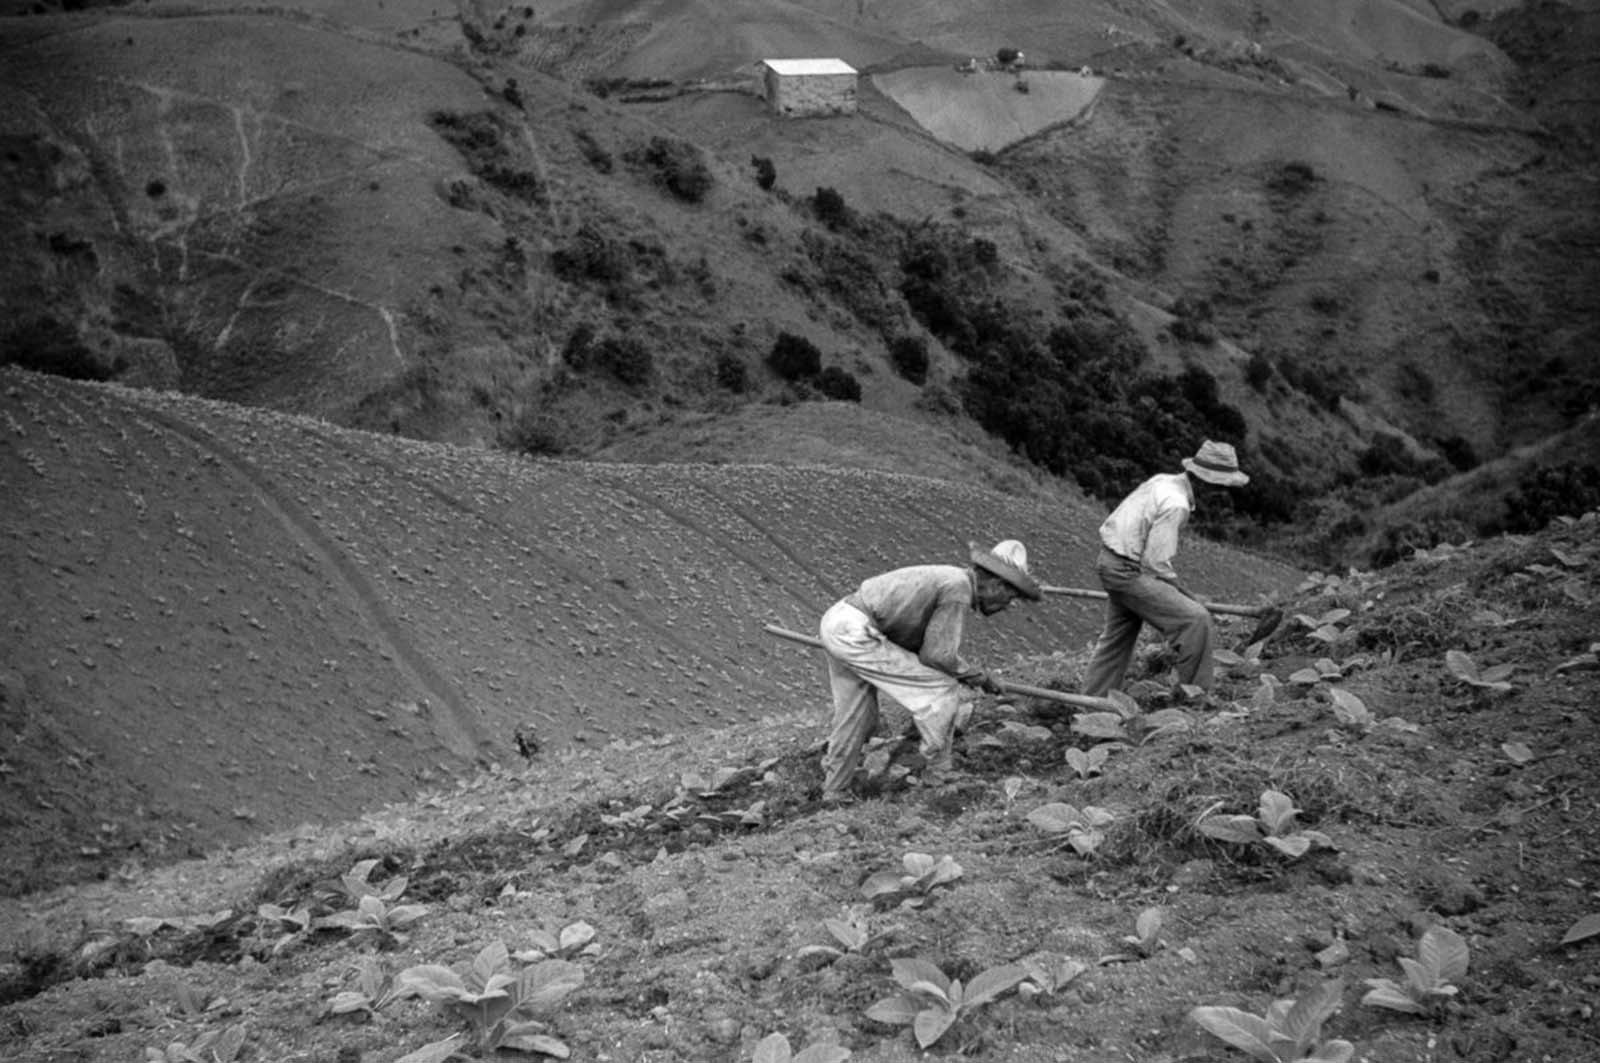 Farmers cultivate tobacco near Barranquitas.